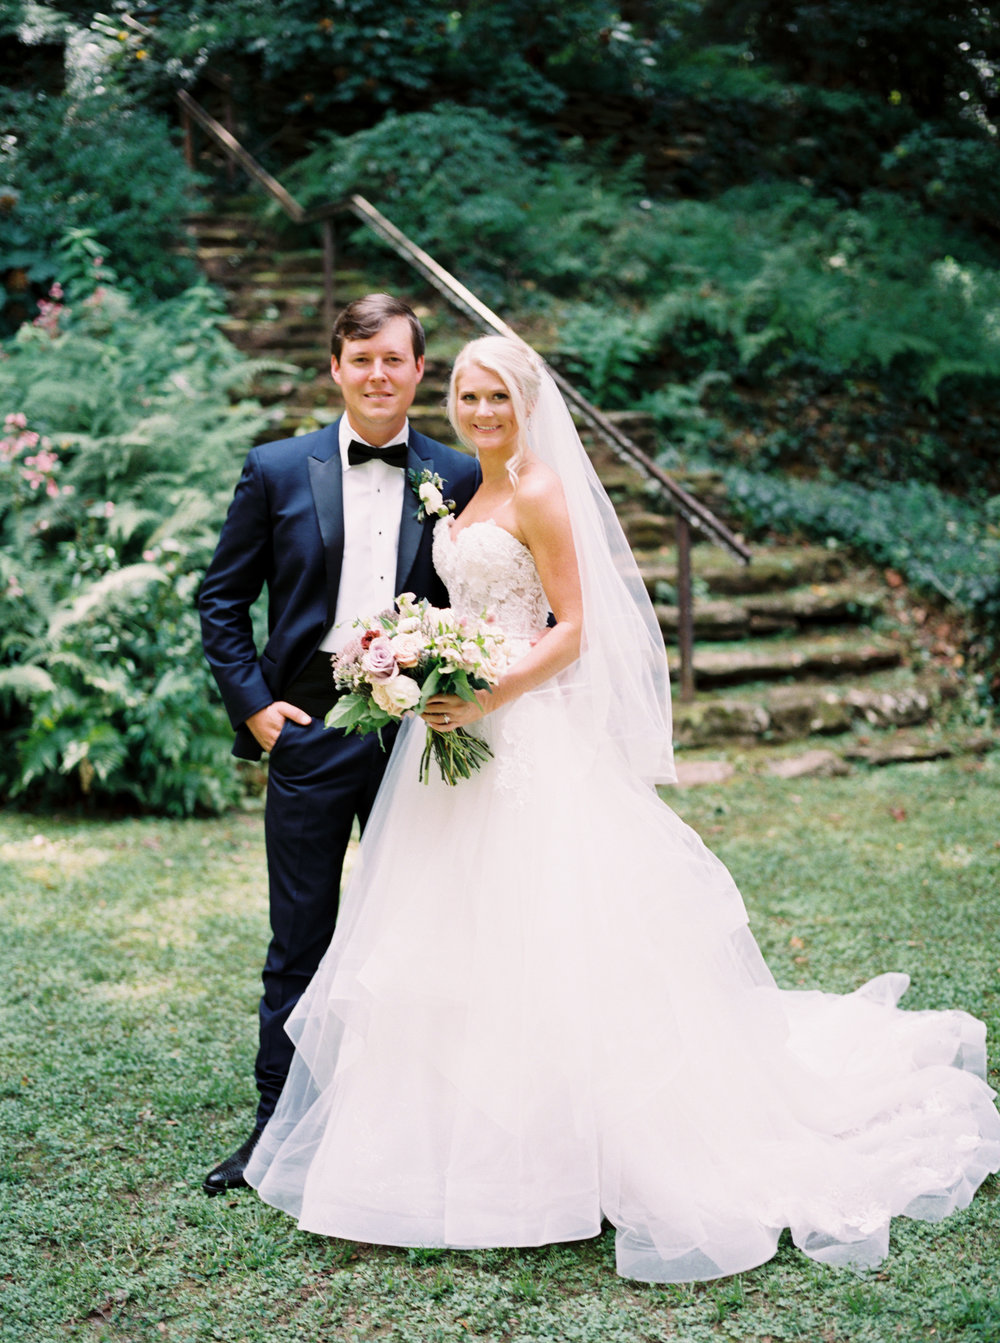 Johnny_Erin_Carter_Dunaway_Gardens_Wedding_Fallen_Photography_Film_Photographer_3c-65.JPG